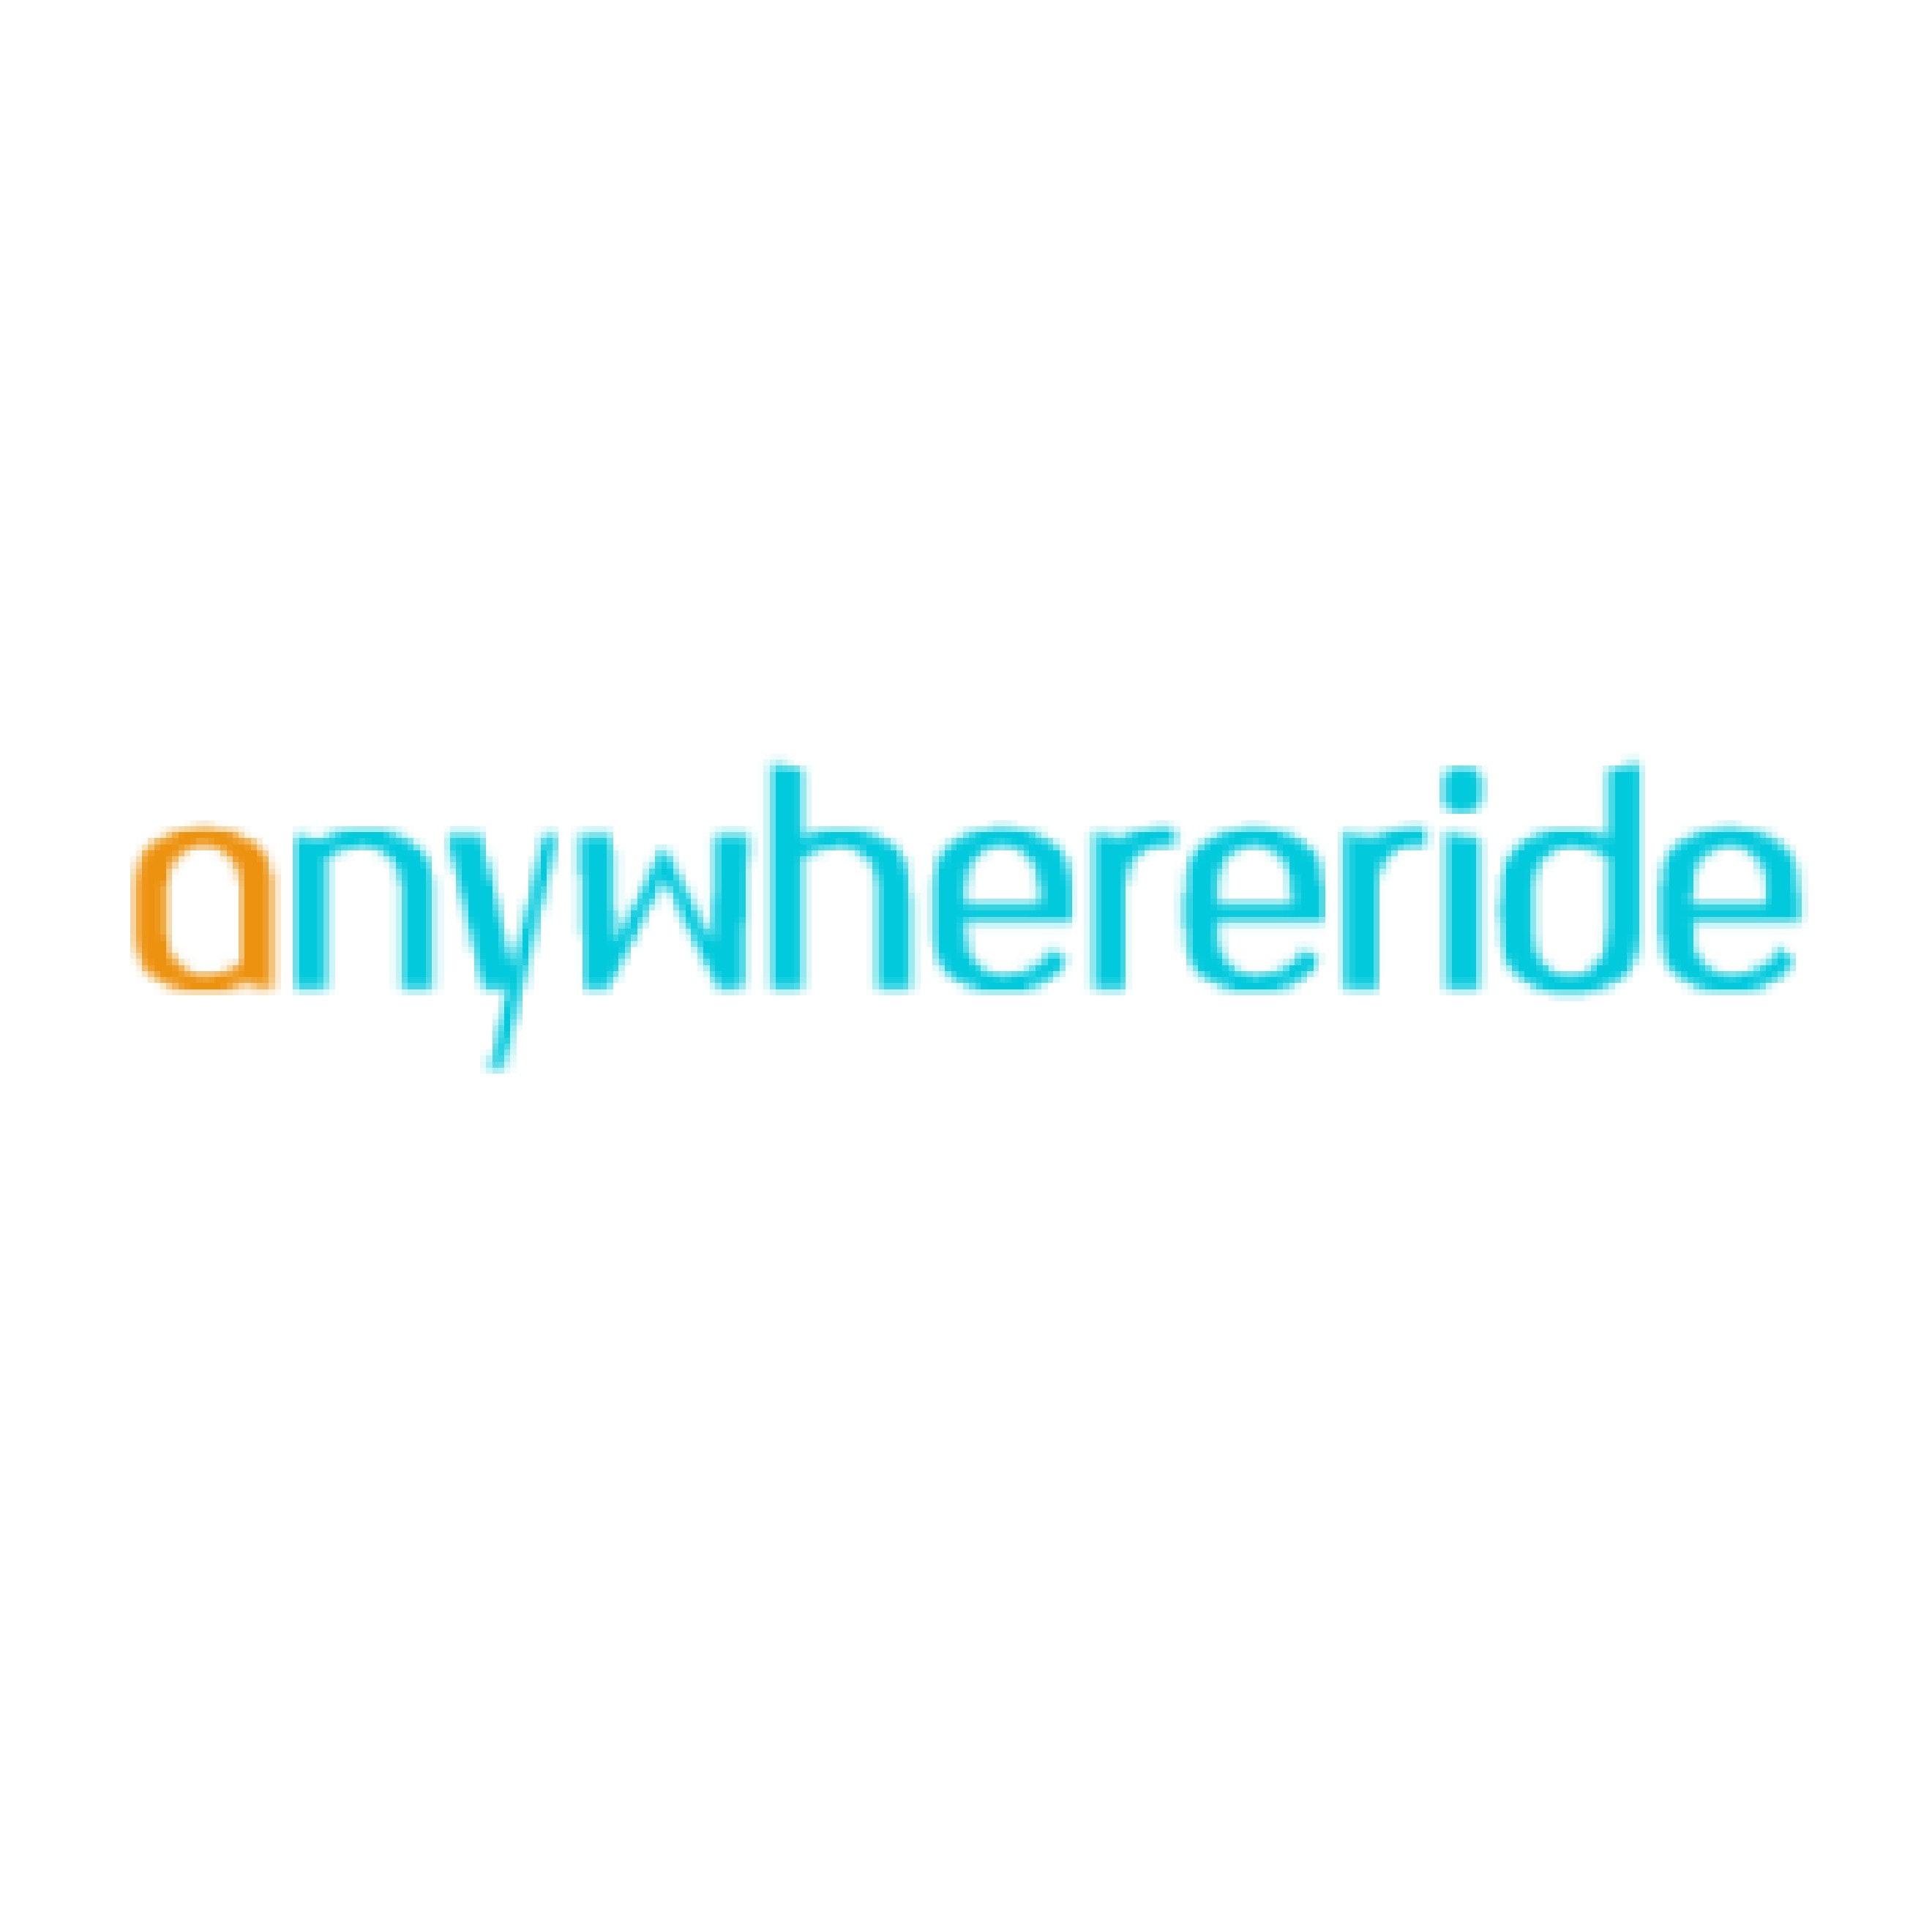 Anywhereride logo